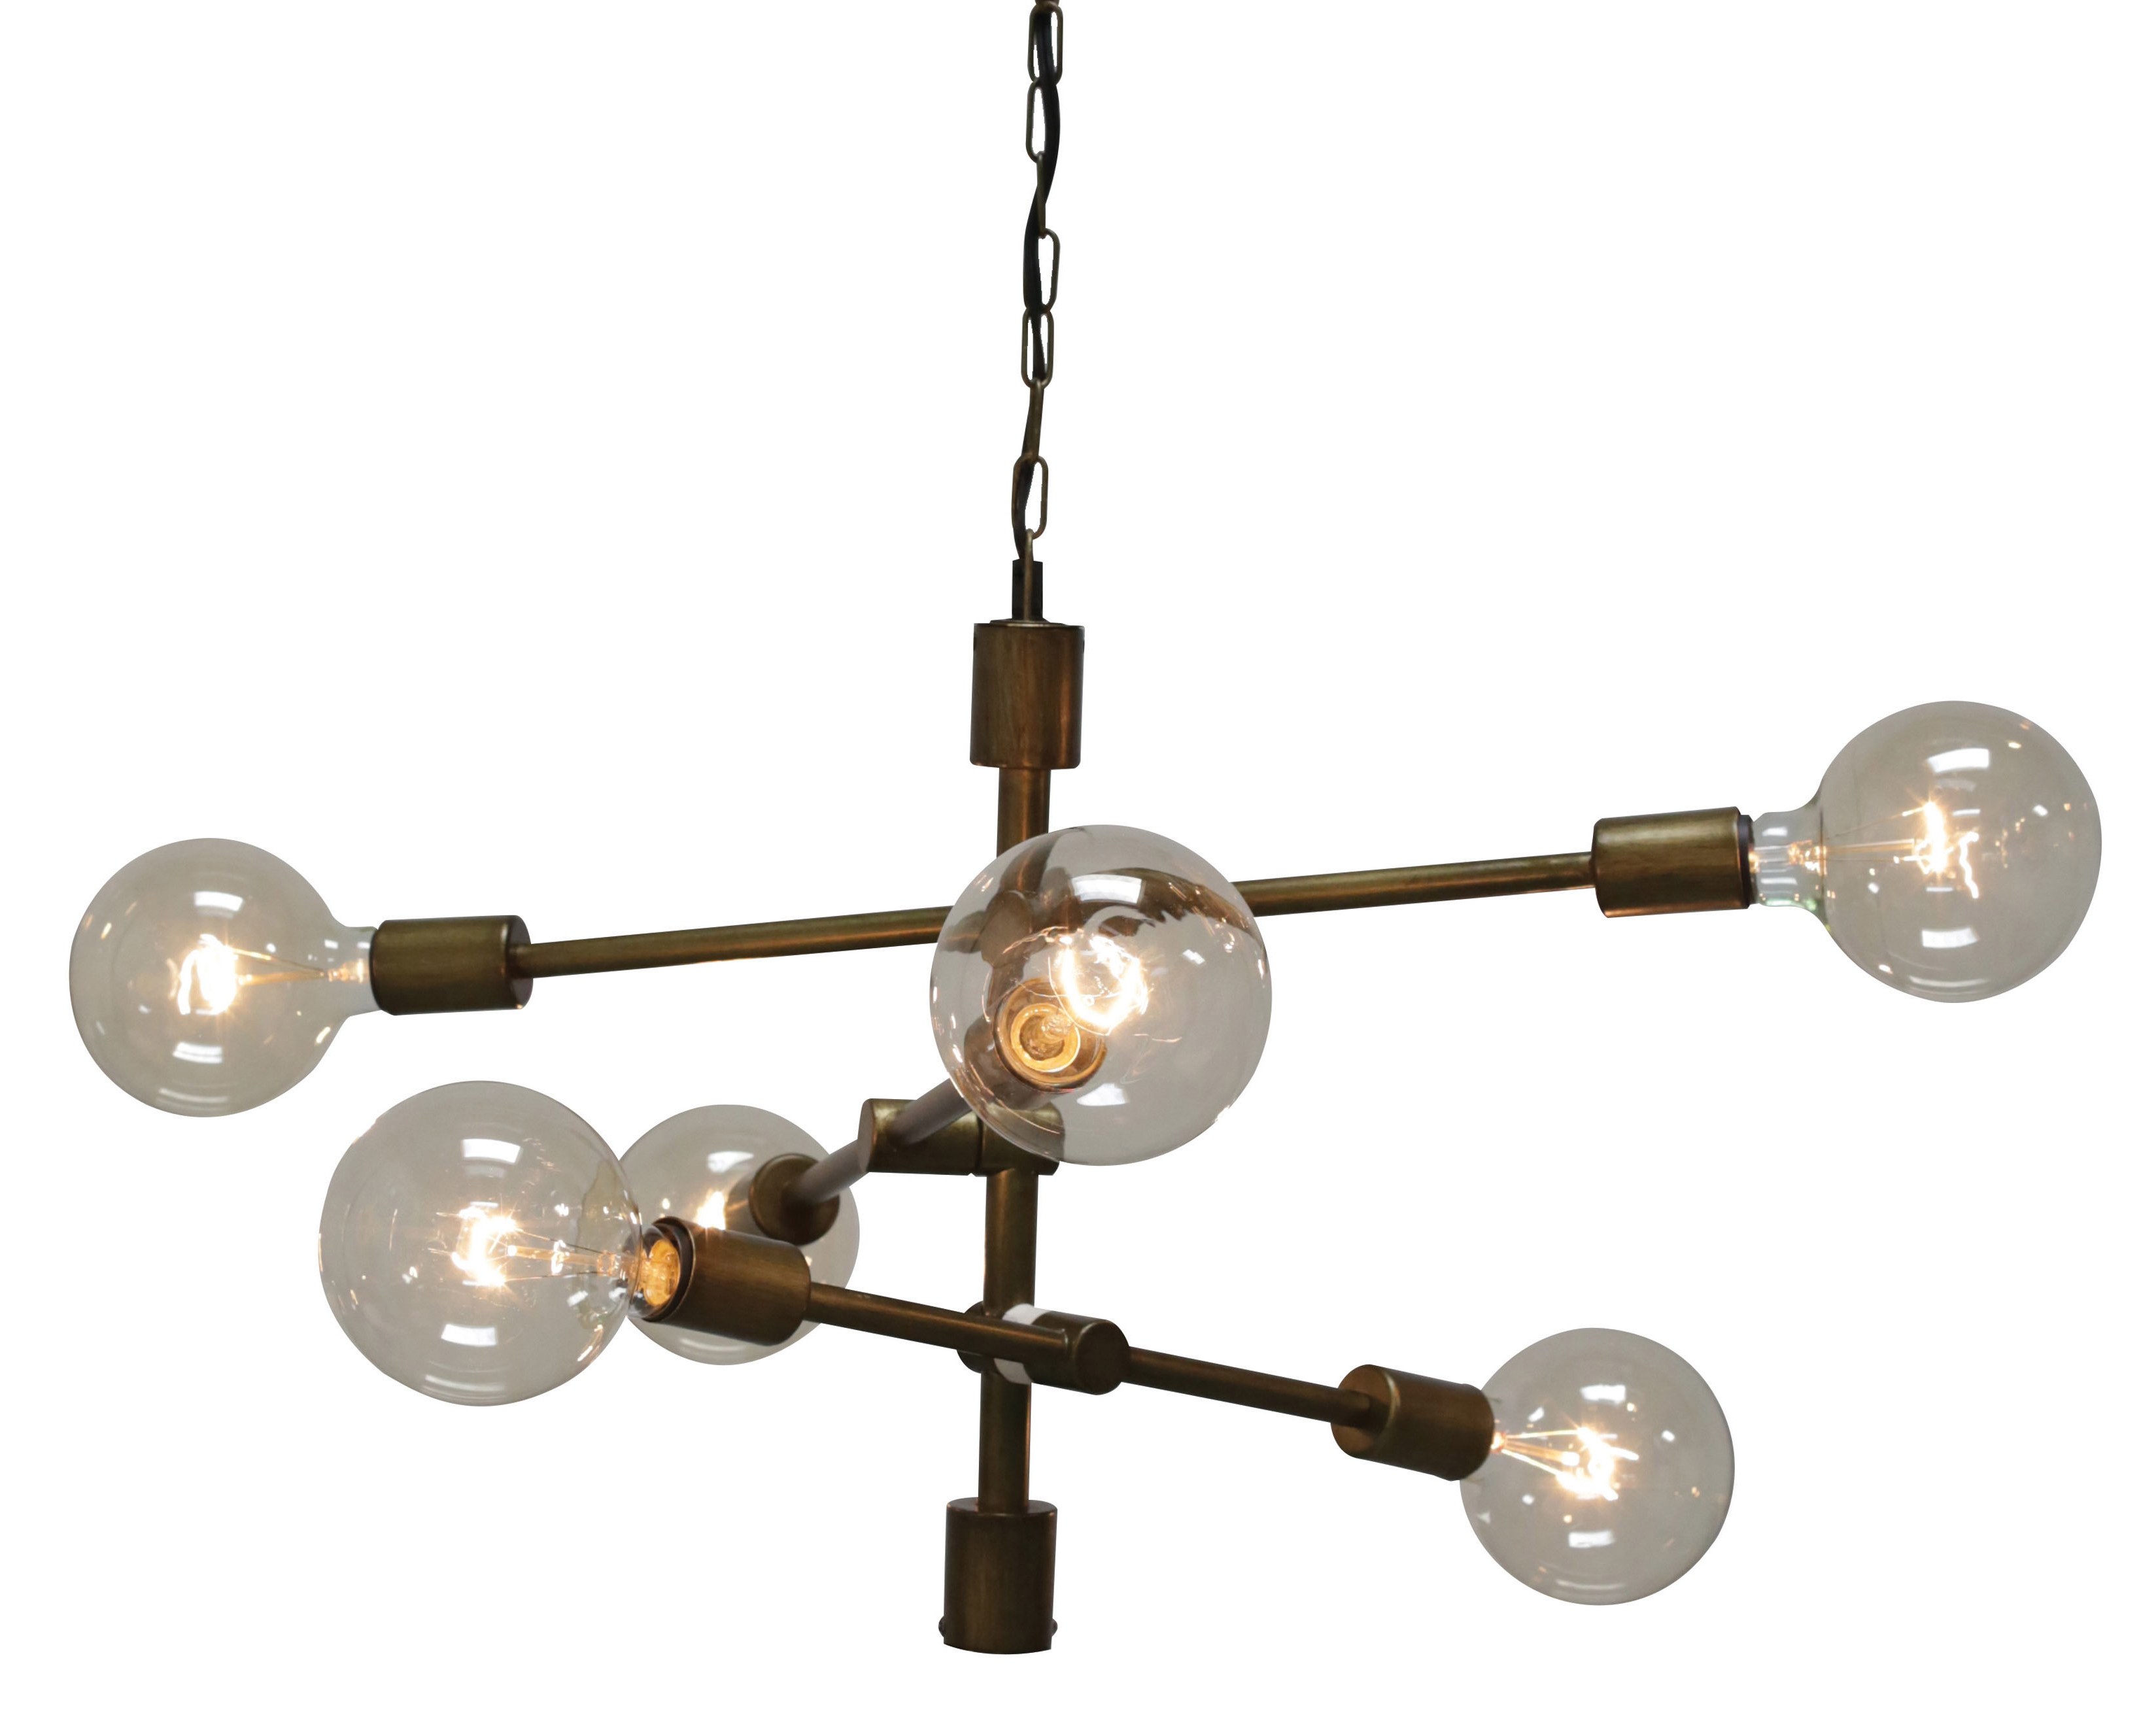 Latest Eladia 6 Light Sputnik Chandeliers Regarding Wunsch 6 Light Sputnik Chandelier (View 14 of 25)